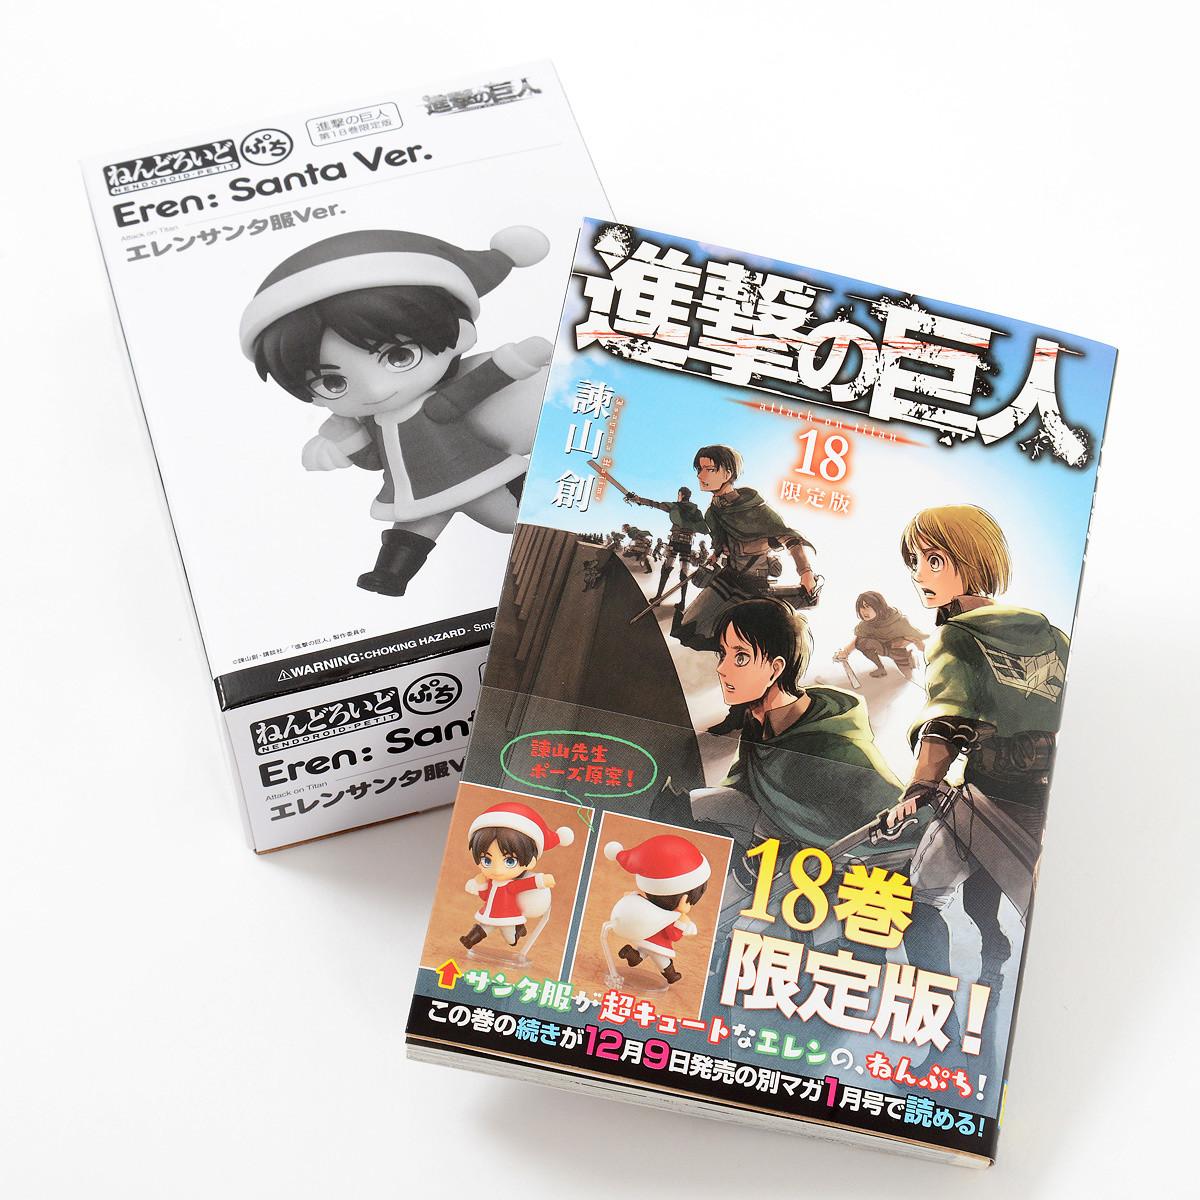 Attack on Titan Vol. 18 Limited Edition - otakumode.com